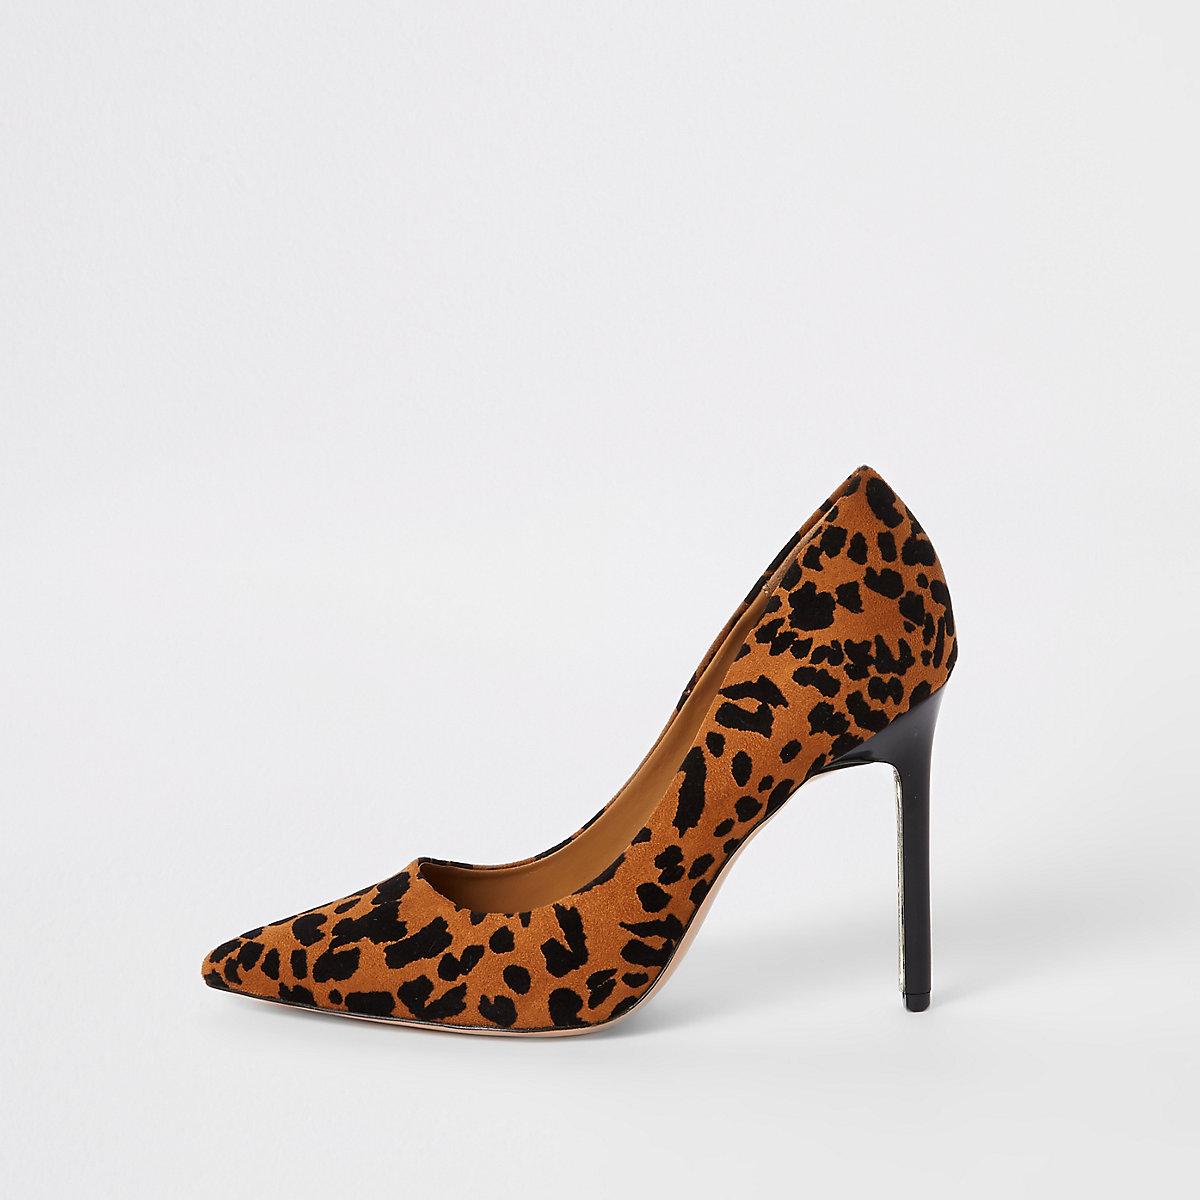 Brown leopard print pumps